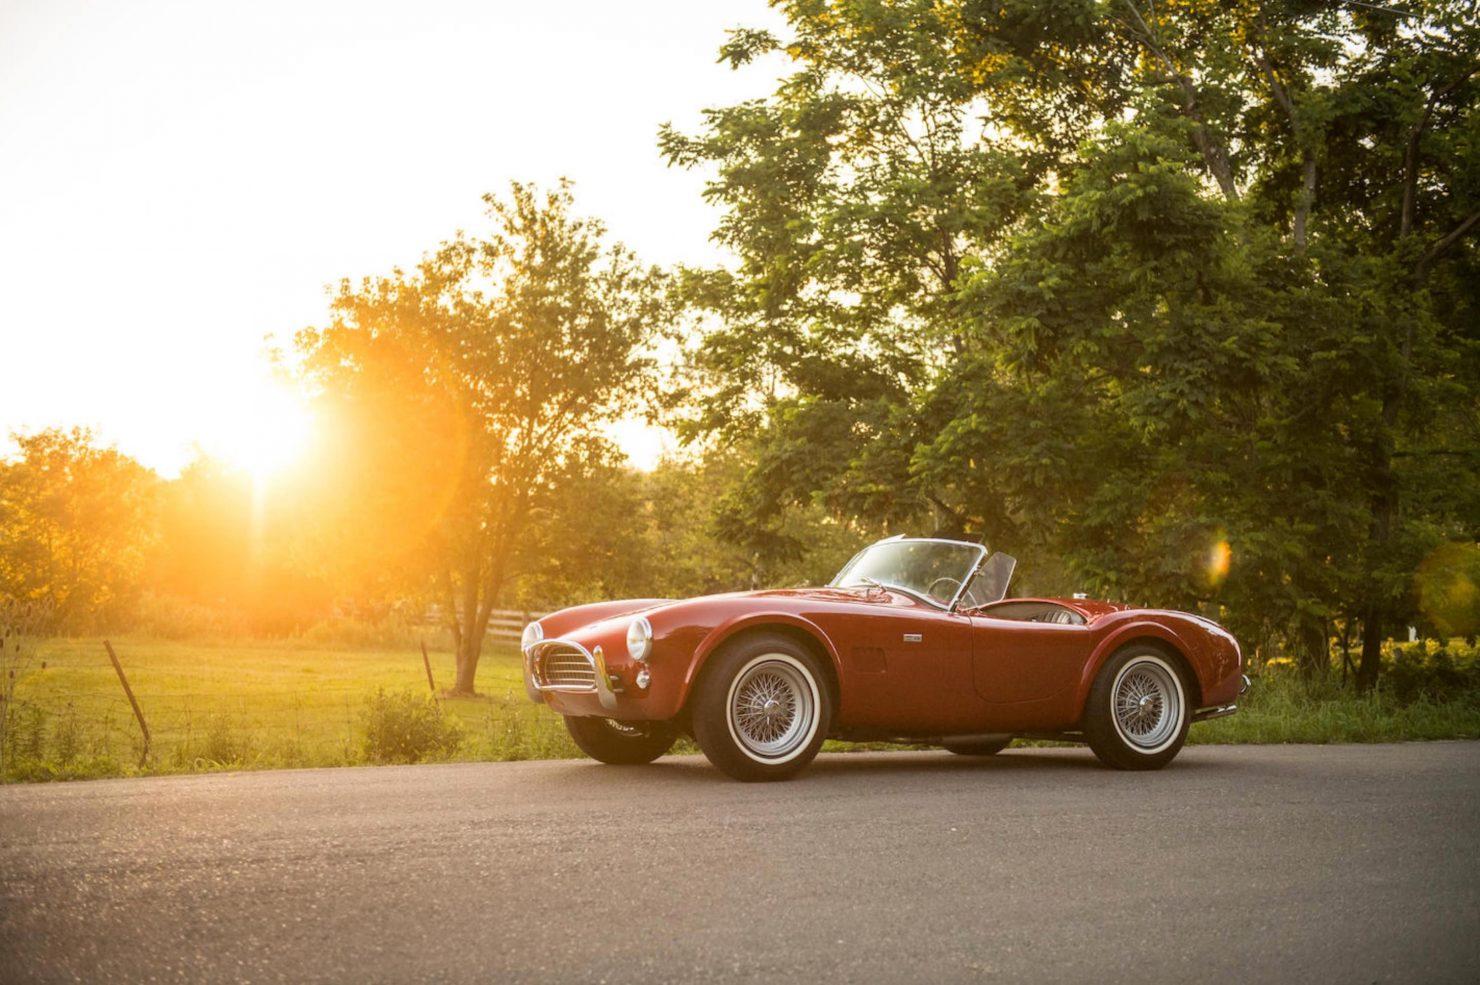 shelby ac cobra 289 33 1480x985 - 1964 Shelby AC Cobra 289